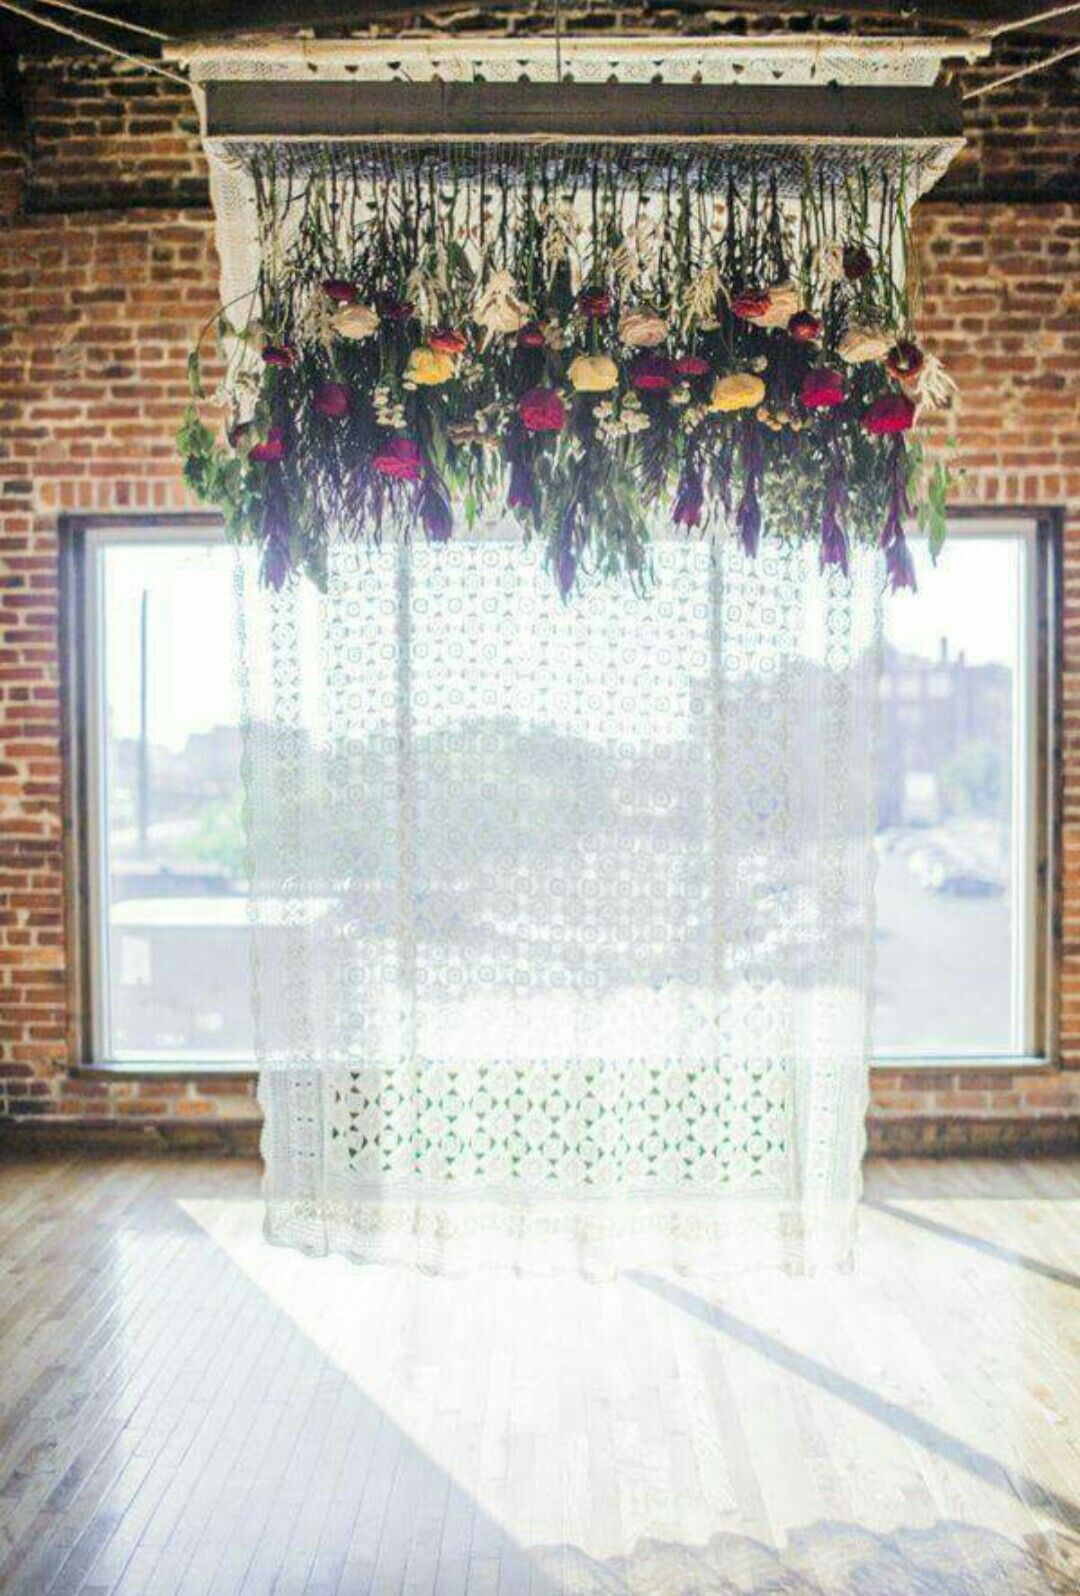 Pin by Cathy Smith on Miriah\'s wedding   Pinterest   Weddings